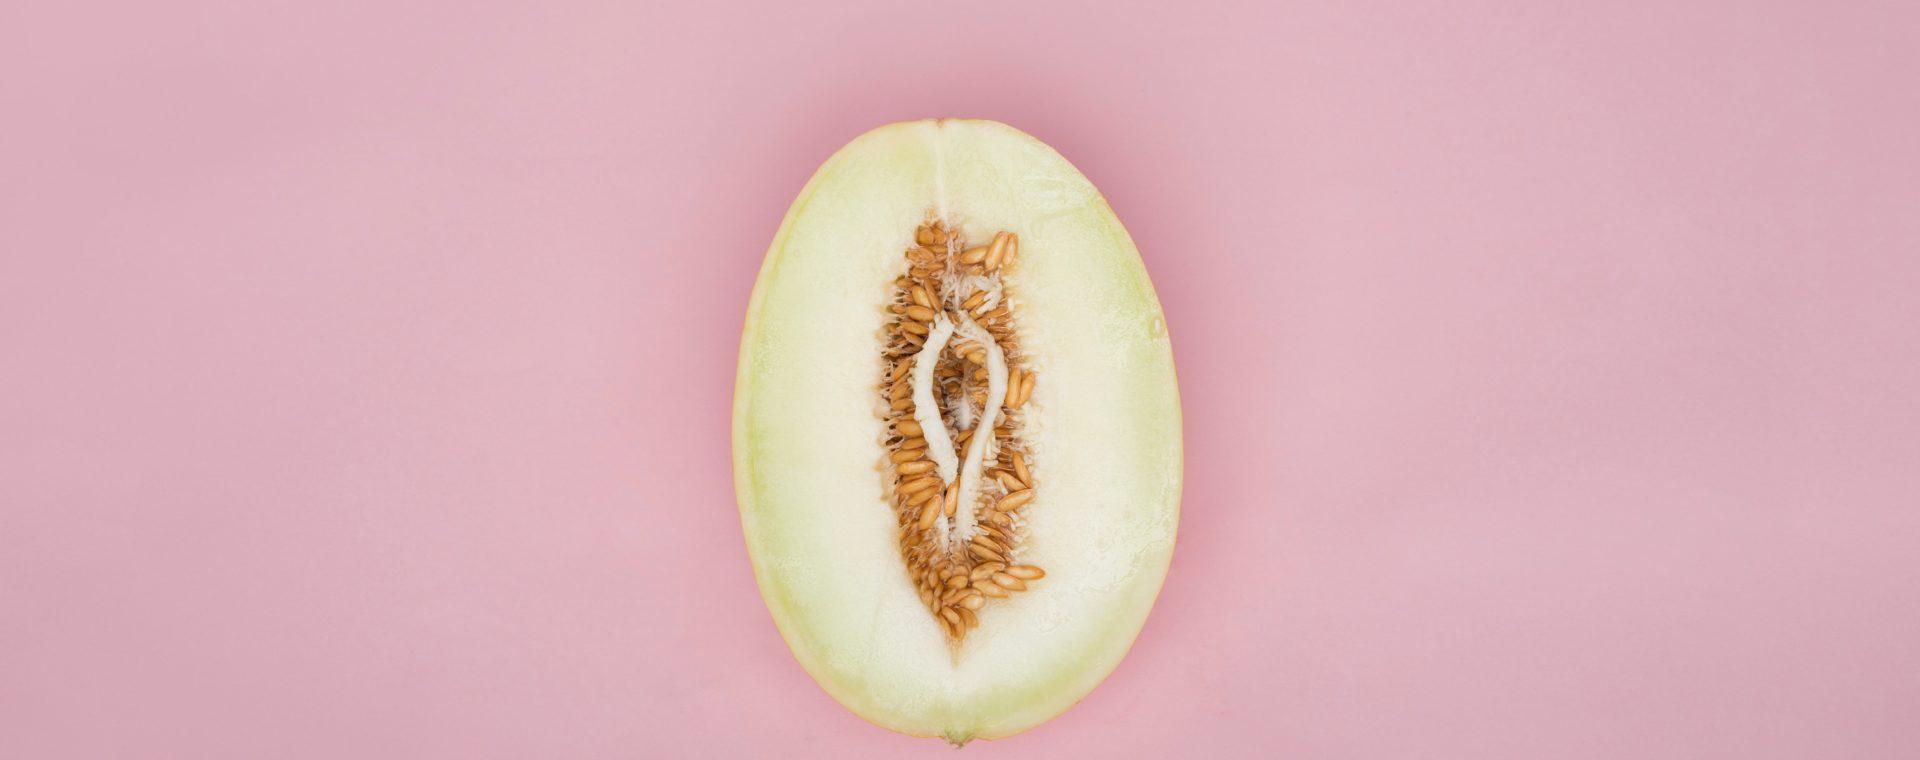 vaginoplastie - nymphoplastie